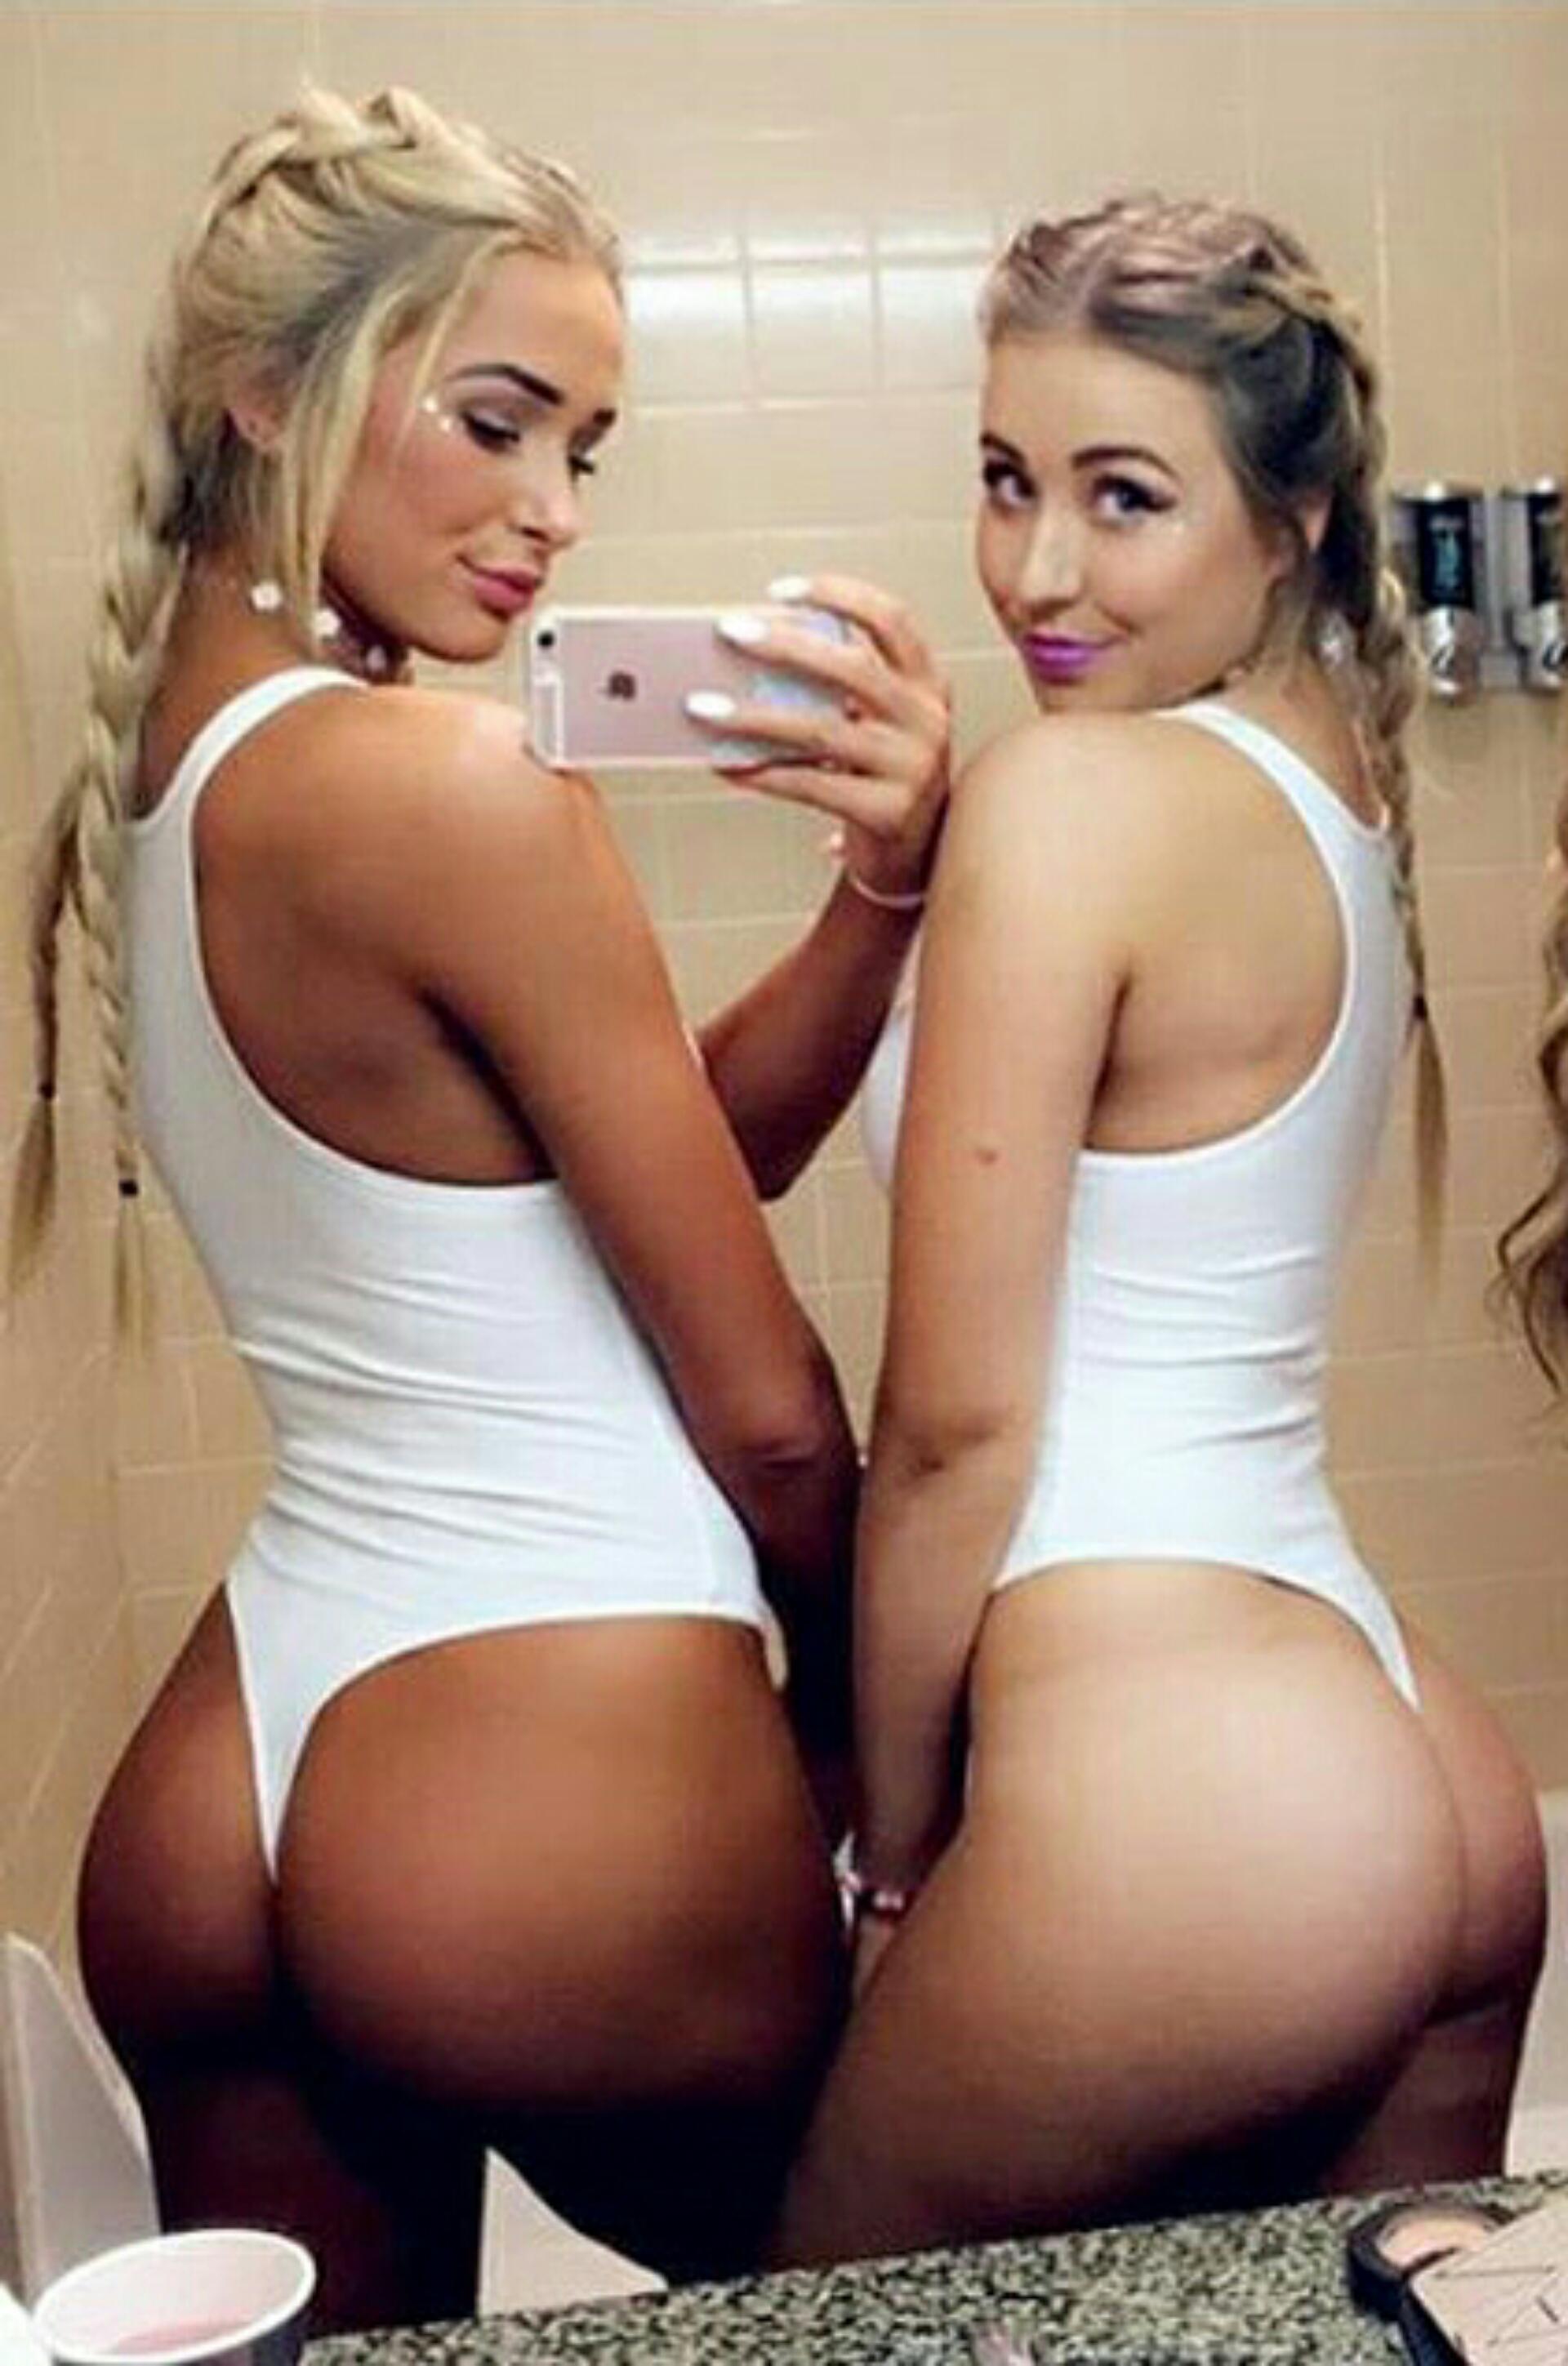 Smooth Buns Naked Girls